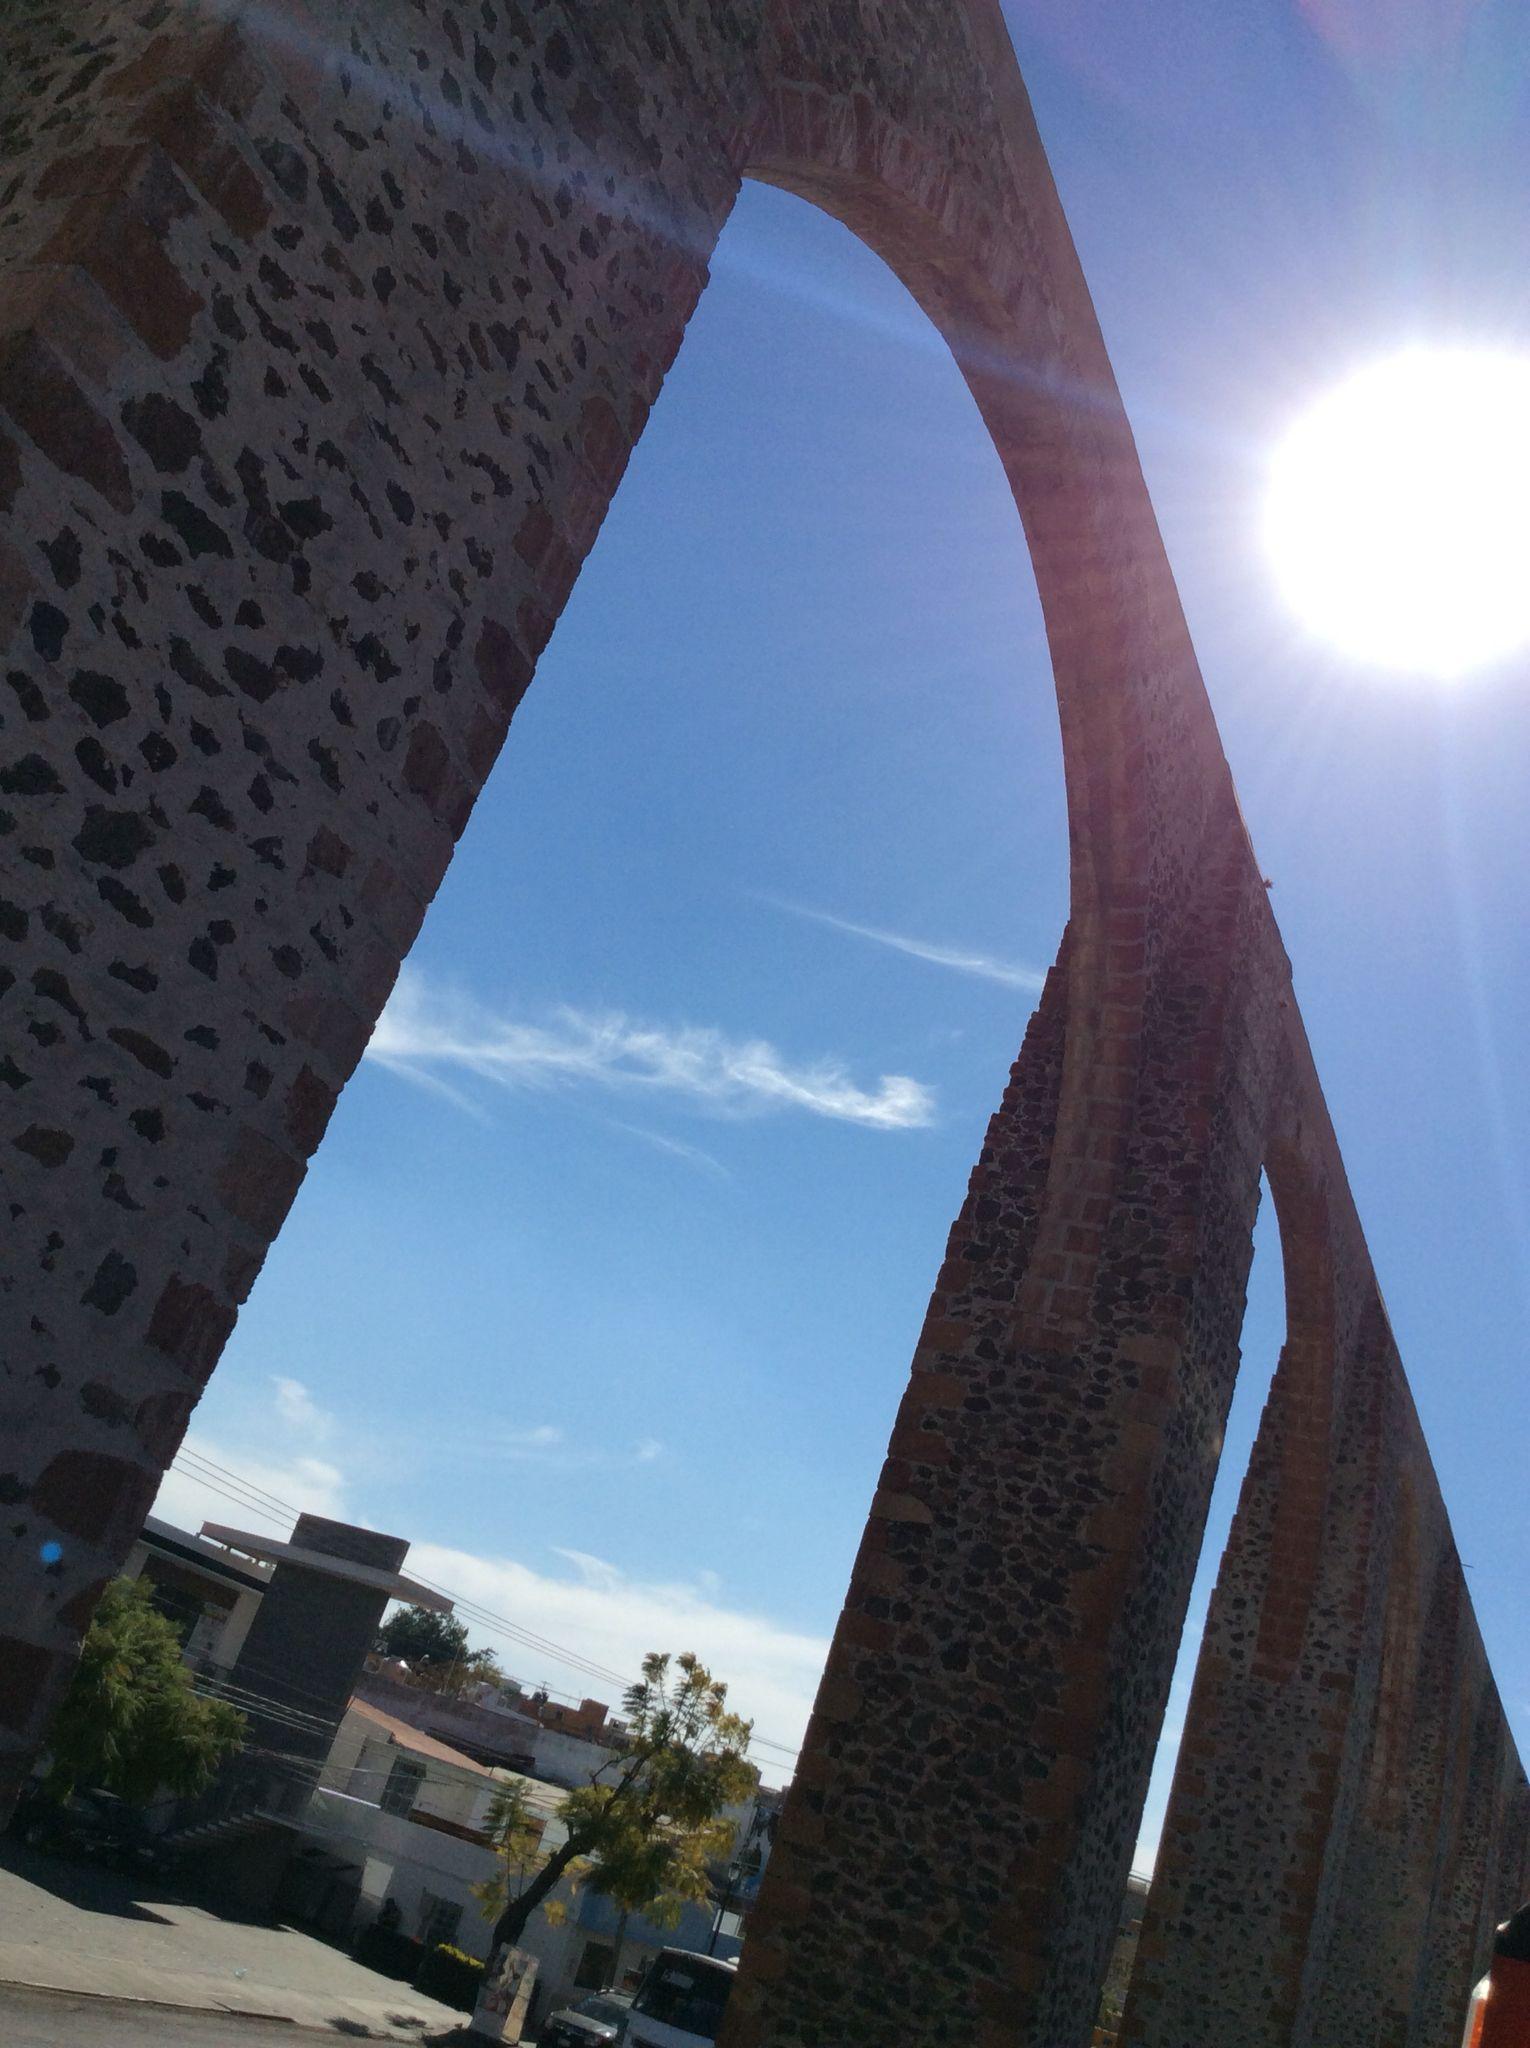 Centro Querétaro  Foto: Angélica Petit de Murat 2016